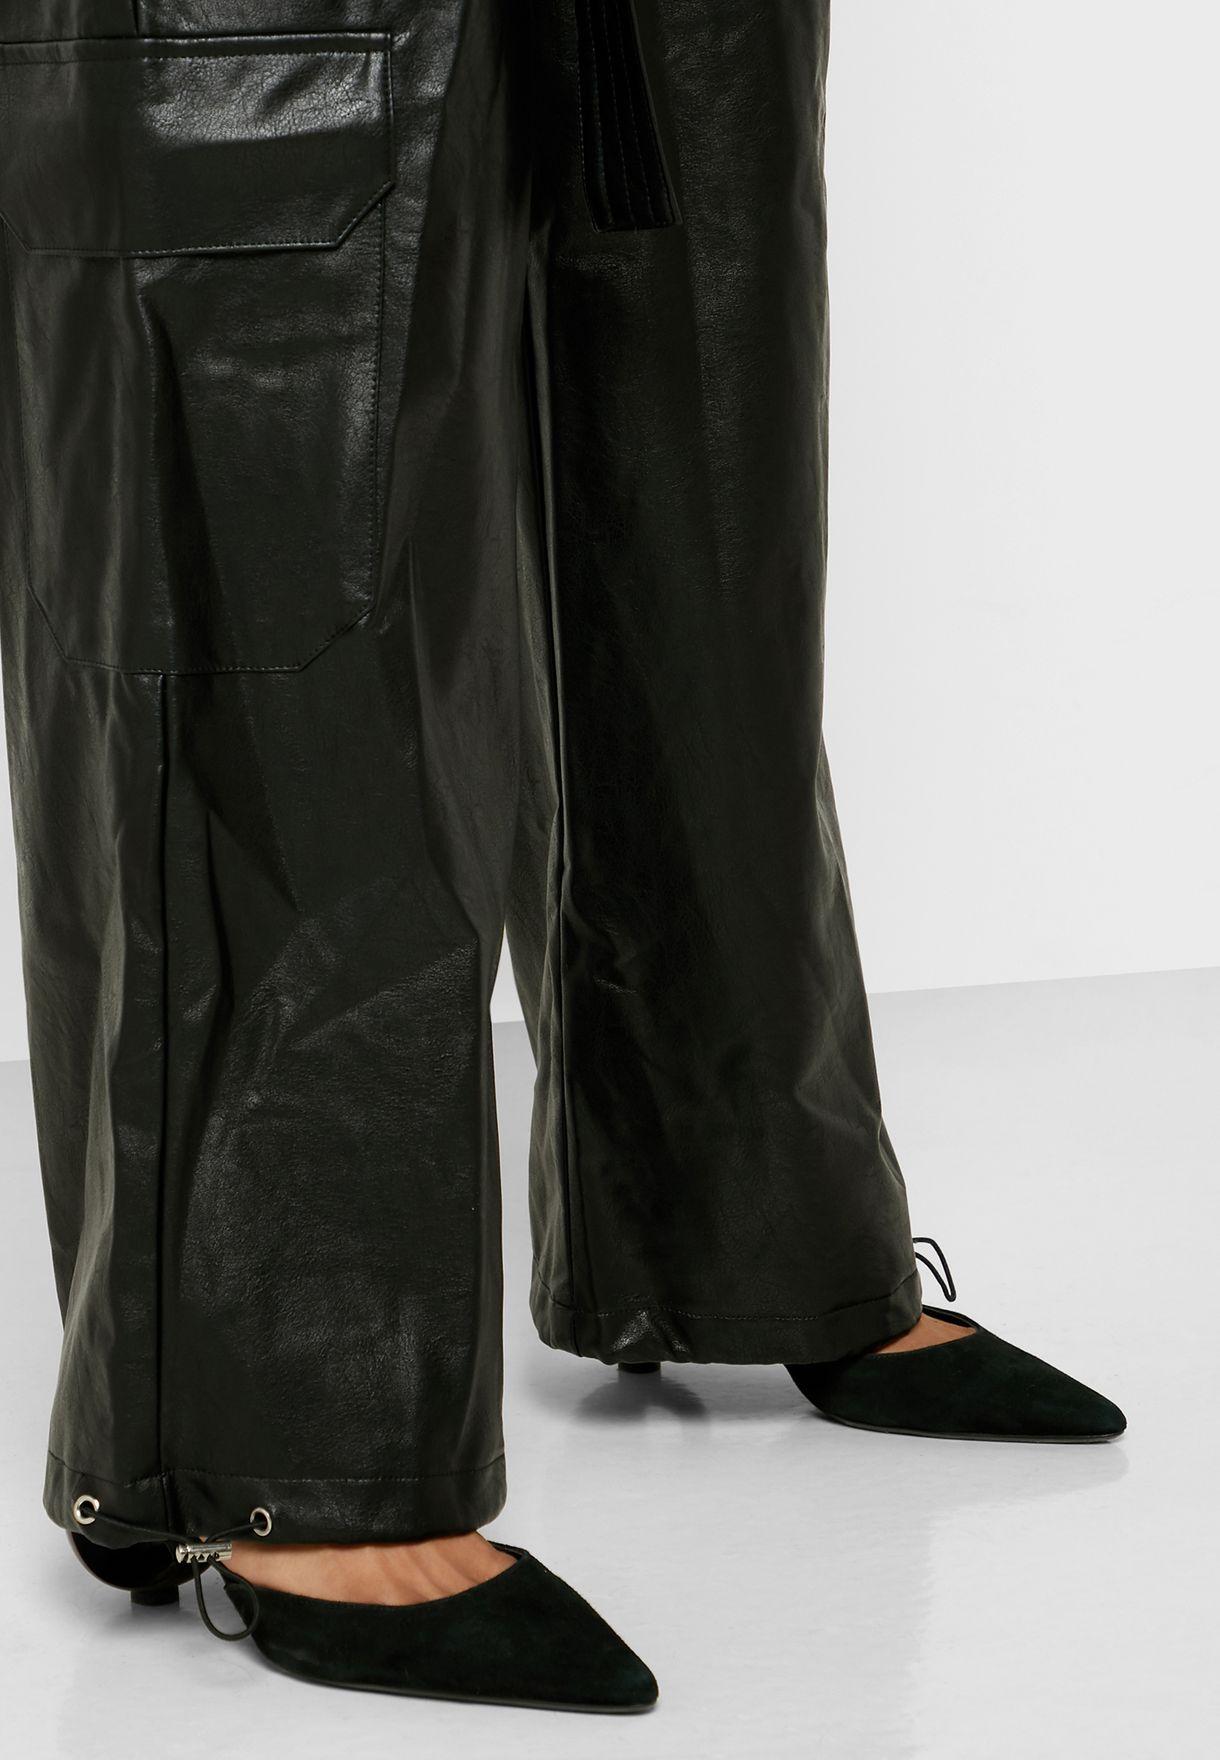 اوفرول طويل (جمبسوت) باربطة خصر